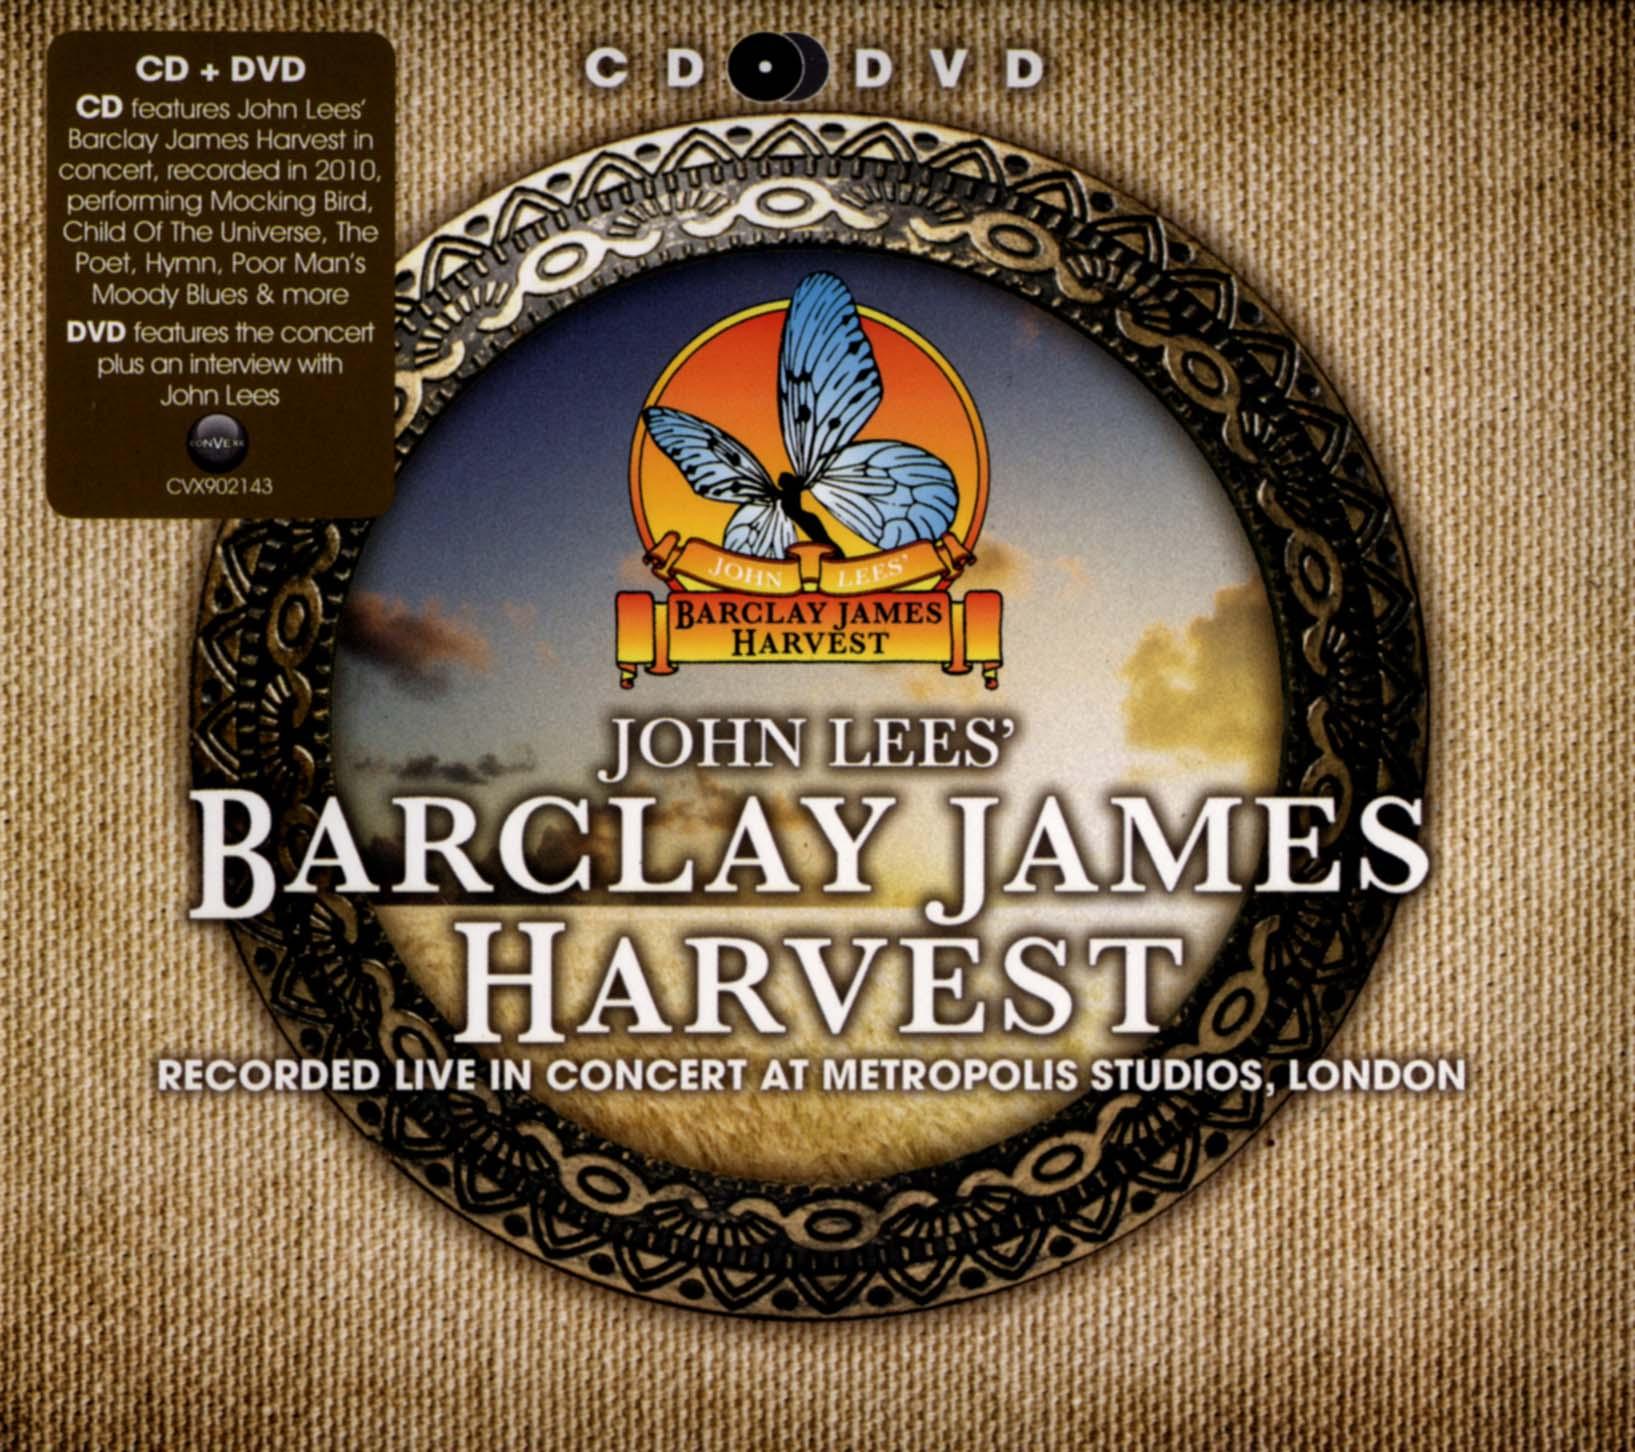 John Lees' Barclay James Harvest: Recorded Live in Concert at Metropolis Studios, London